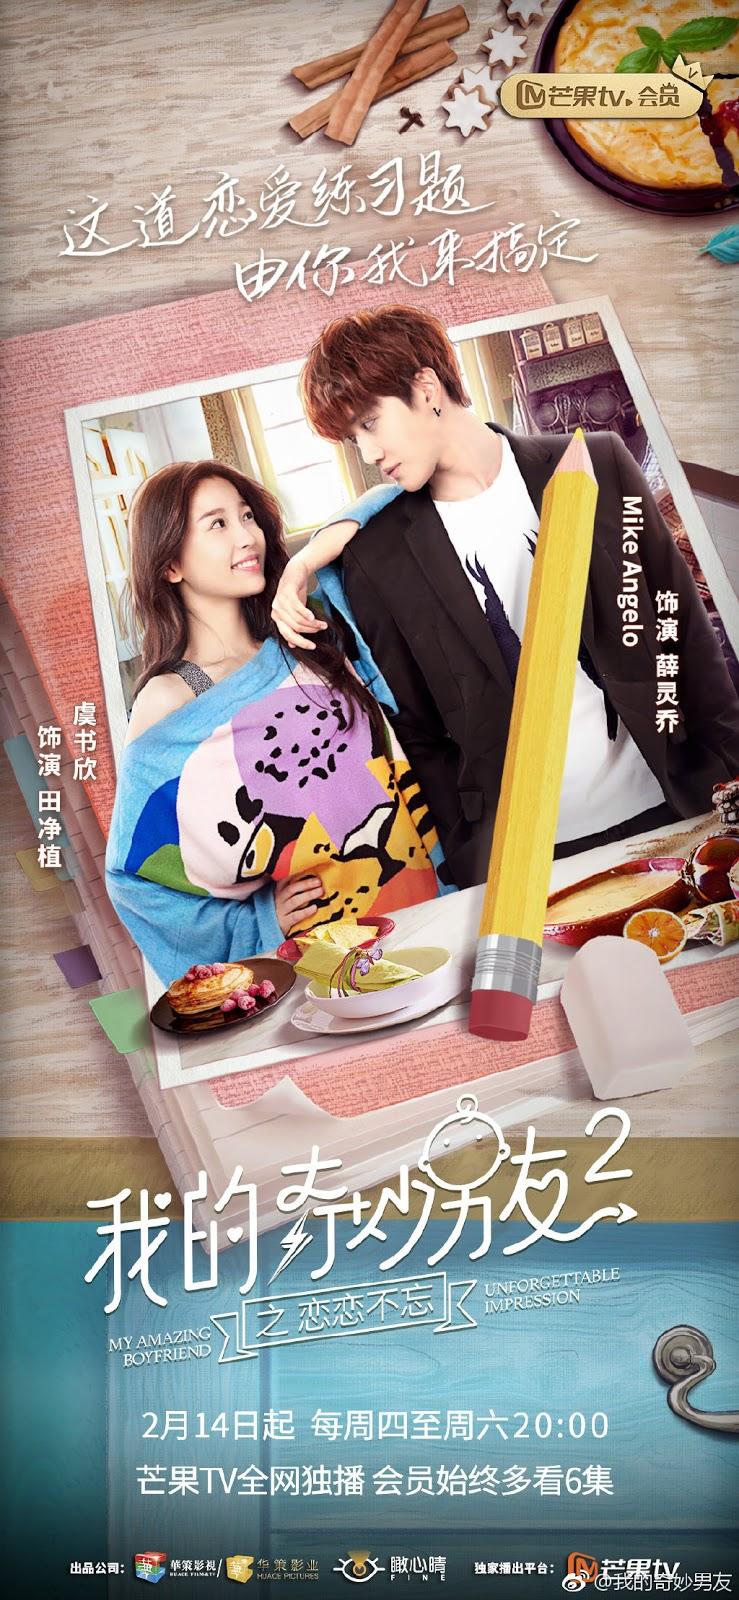 my amazing boyfriend 2 cdrama poster